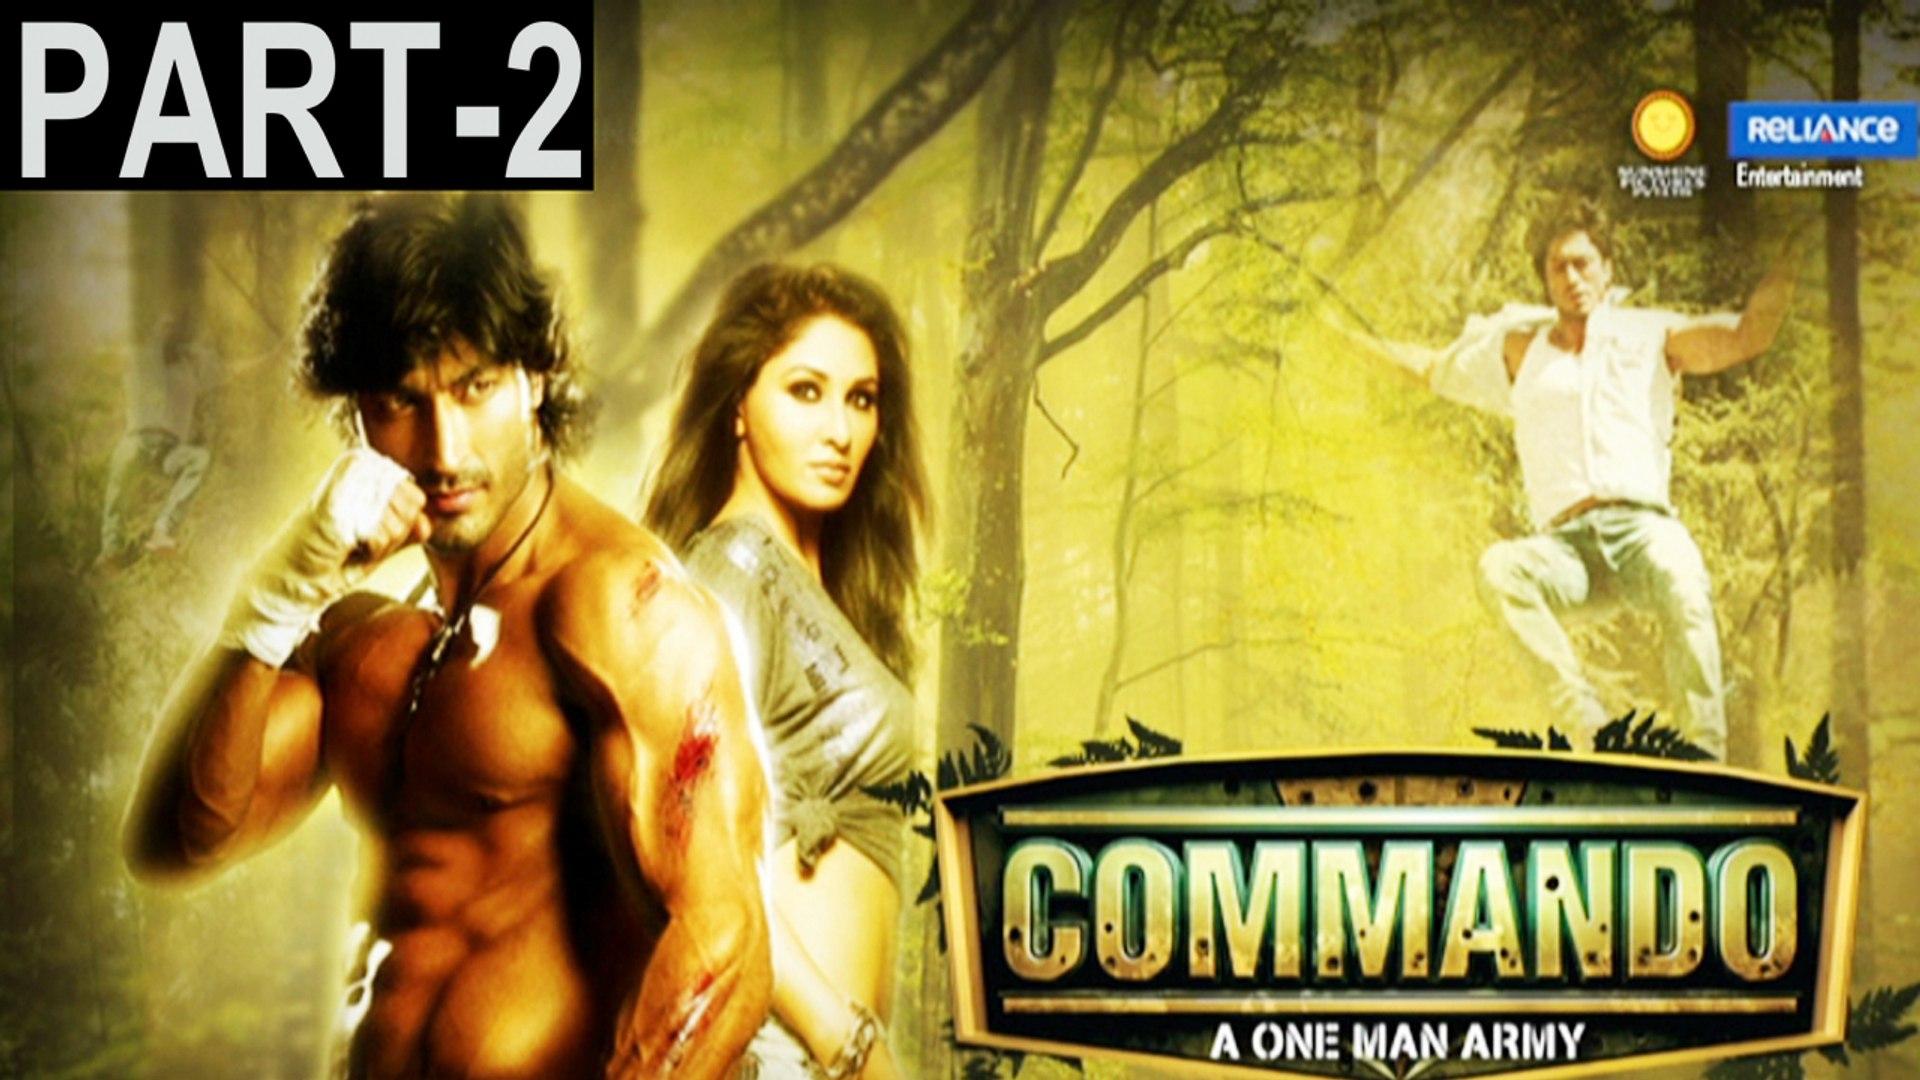 Commando 2013 Full Movie Part 2-Vidyut Jamwal-Pooja Chopra-Jaideep  Ahlawat-A-status - video dailymotion